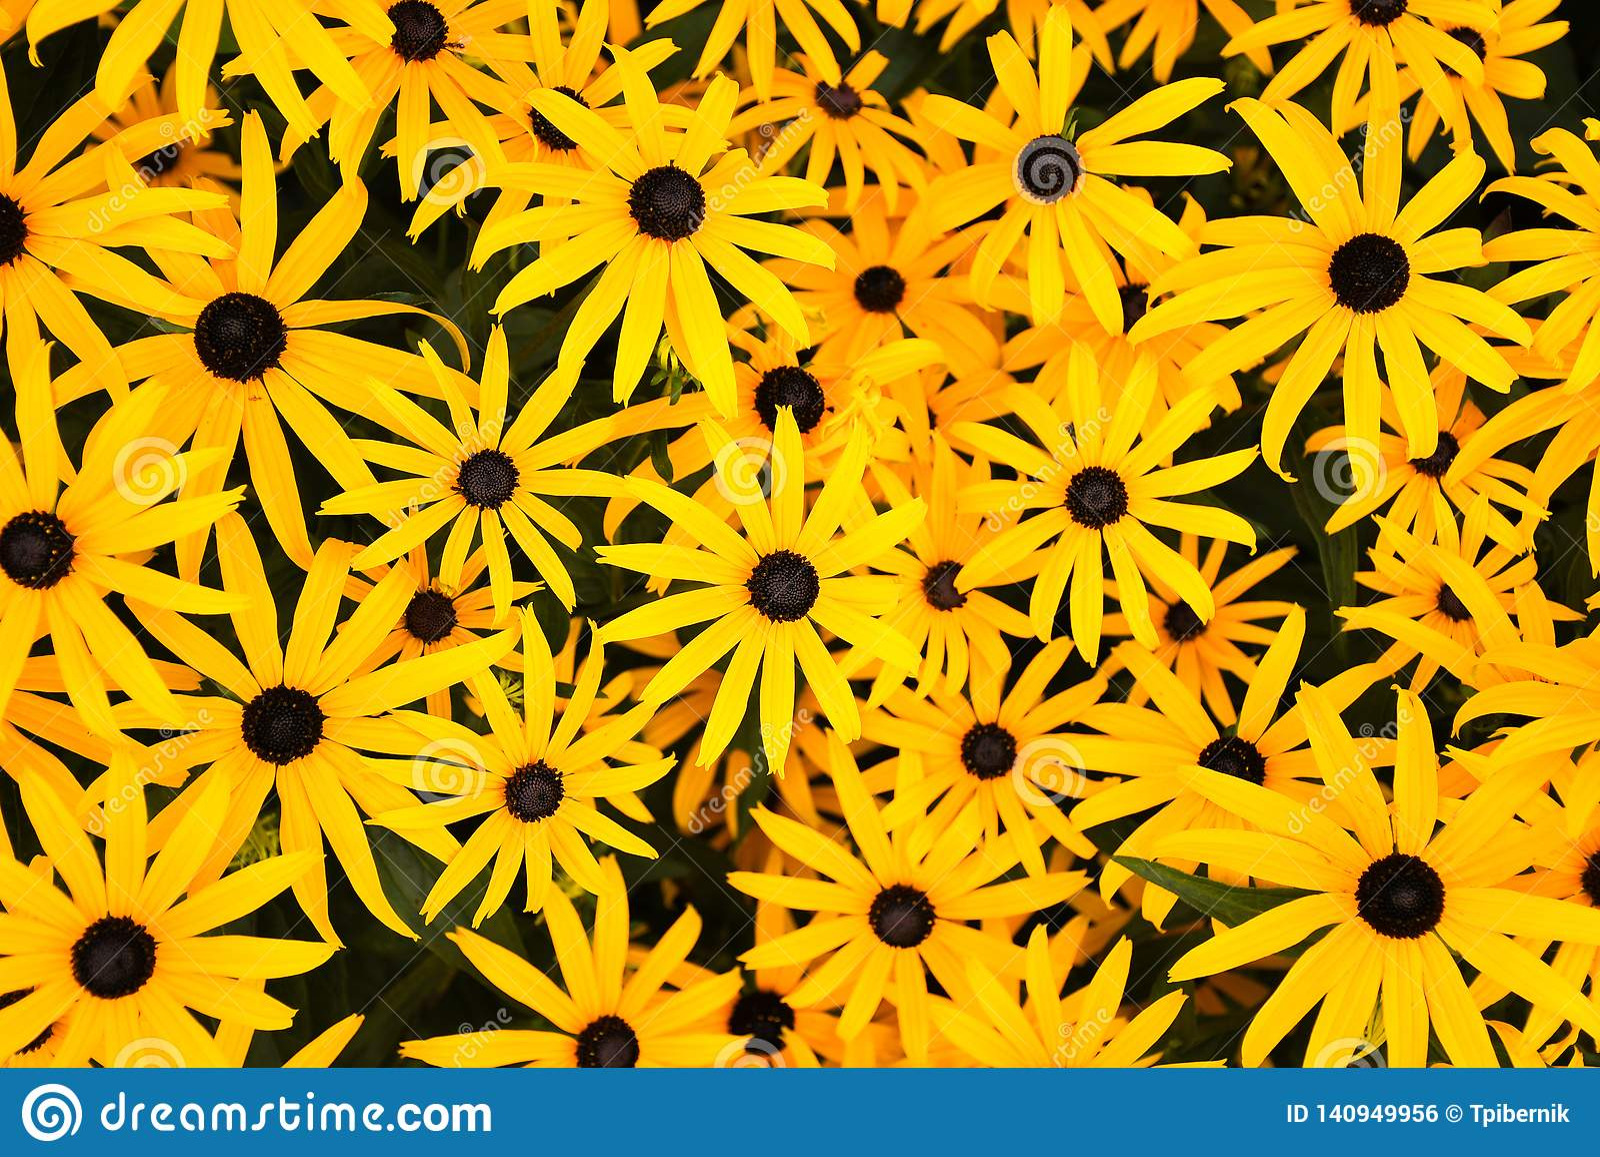 Groep bloeiende glanzende gele bloemen